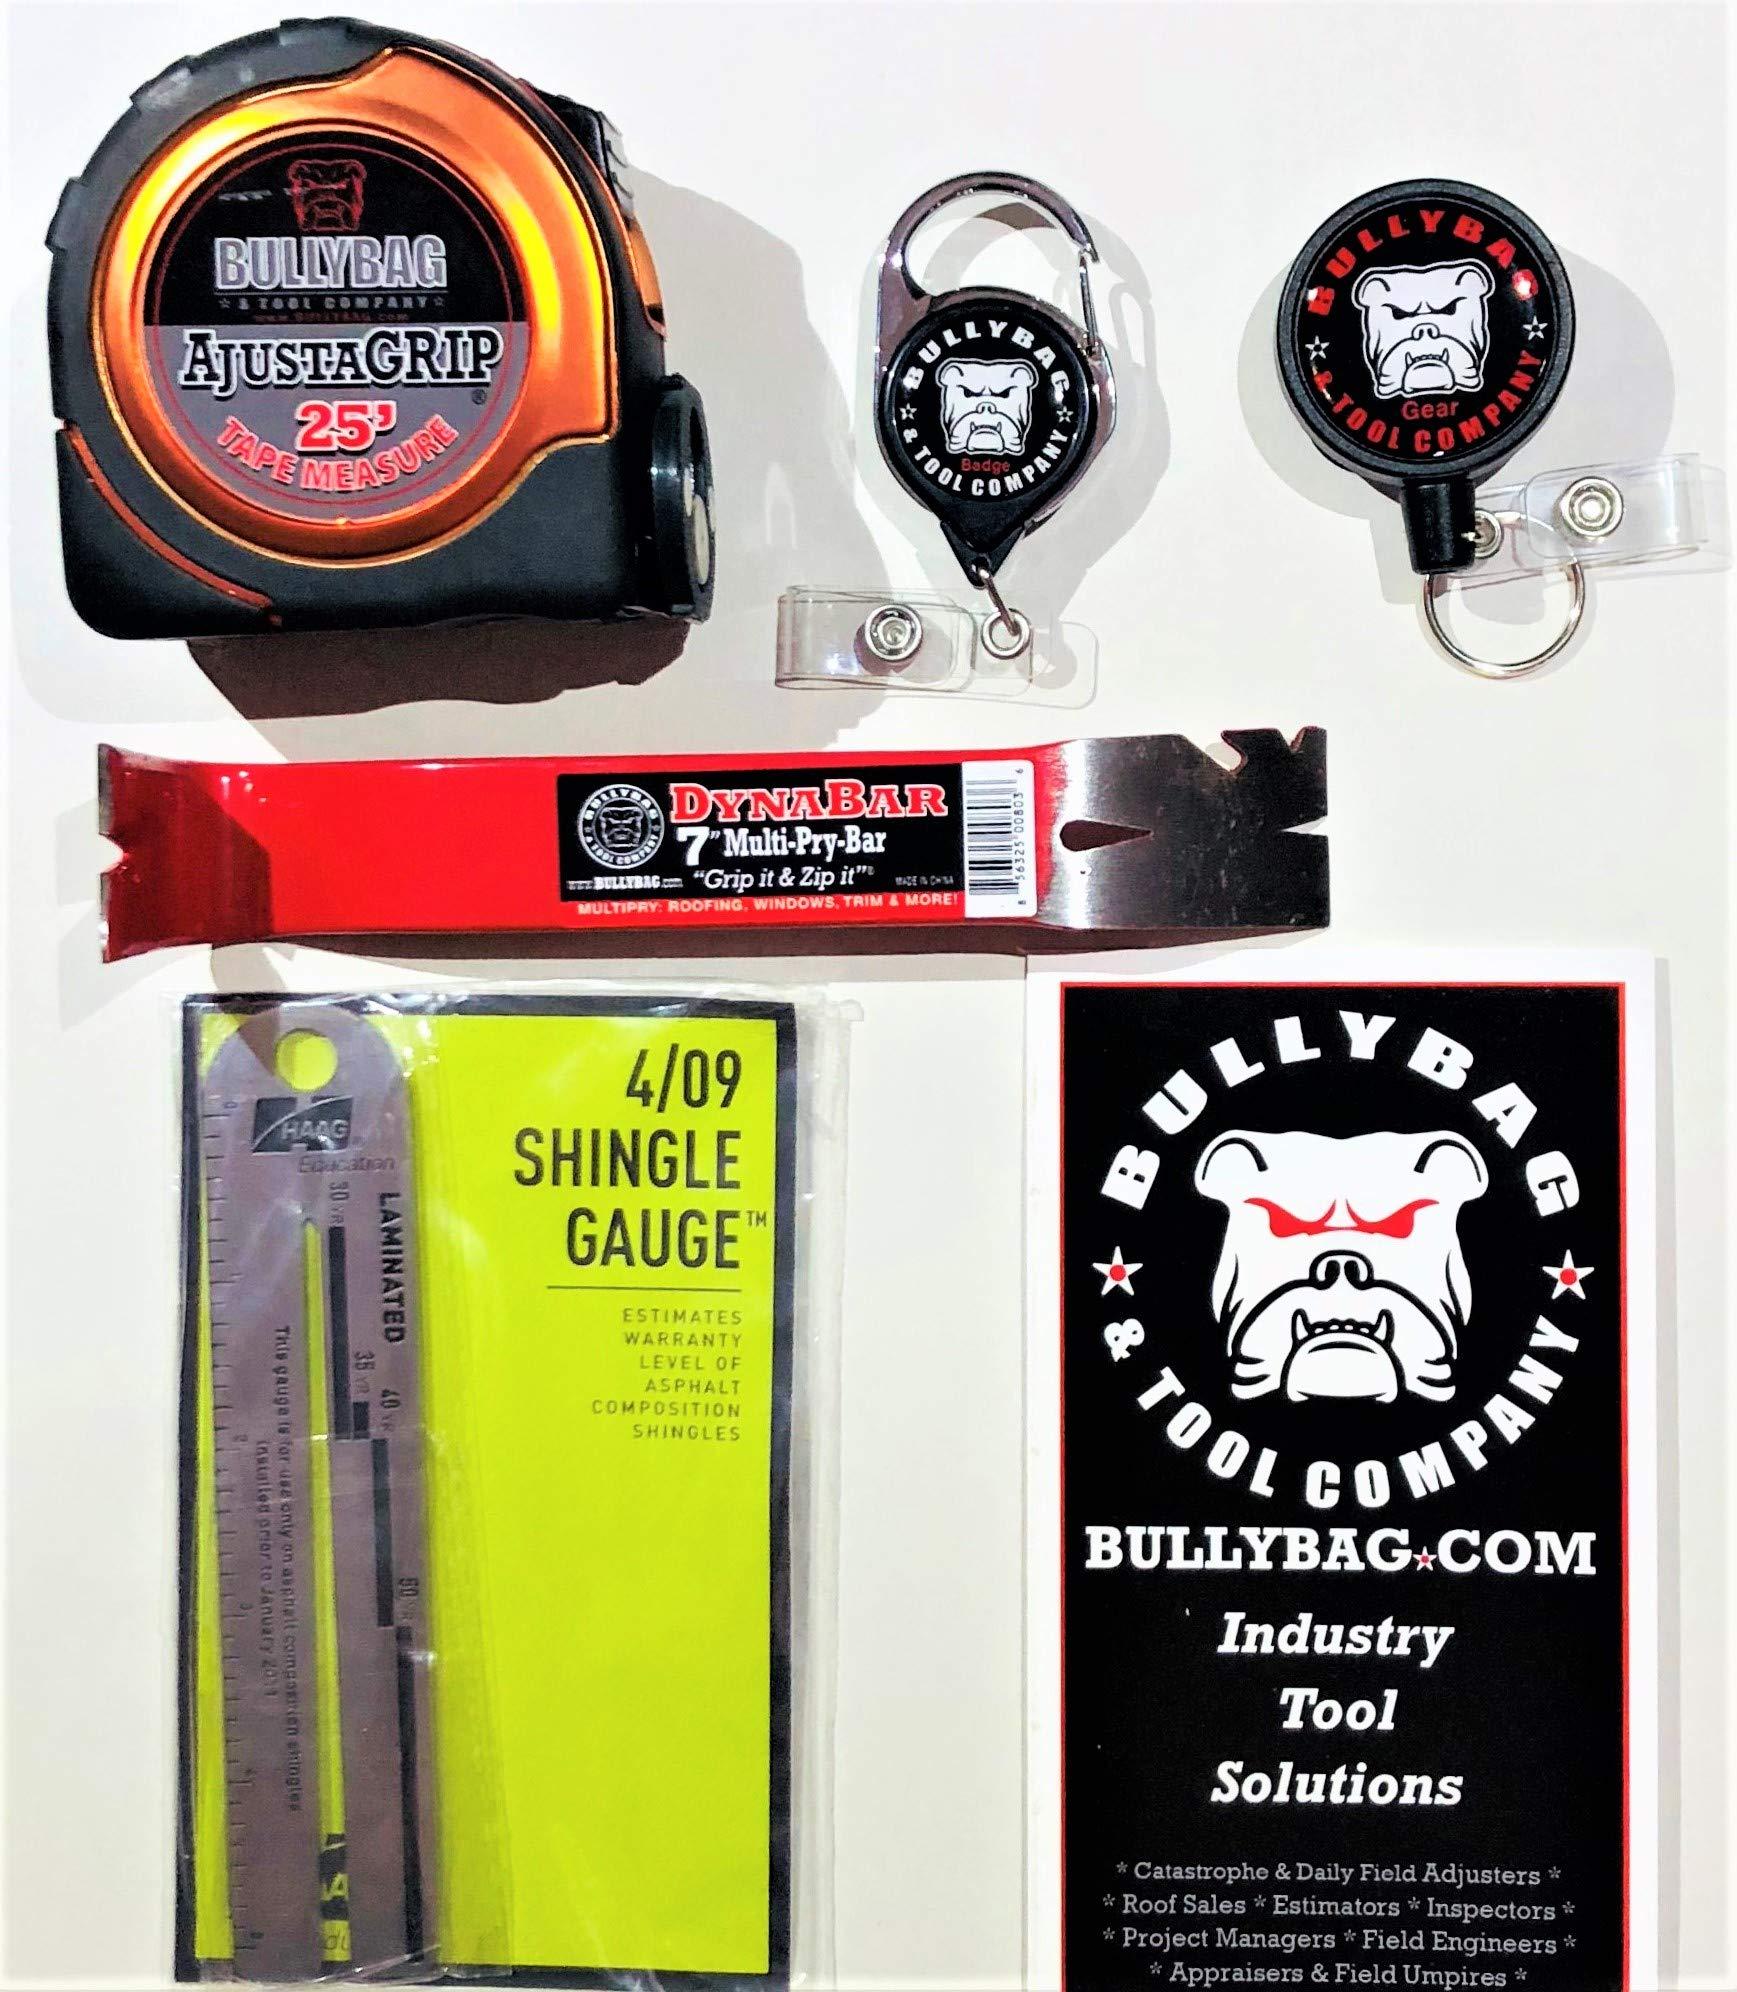 5 Pack of Tools - Haag 4/09 Shingle Gauge; BullyBag AdjustaGRIP 25' Tape Measure; BullyBag DynaBar 7'' Pry Bar; BullyBag Retractable Badge Retainer & BullyBag Gear Retainer